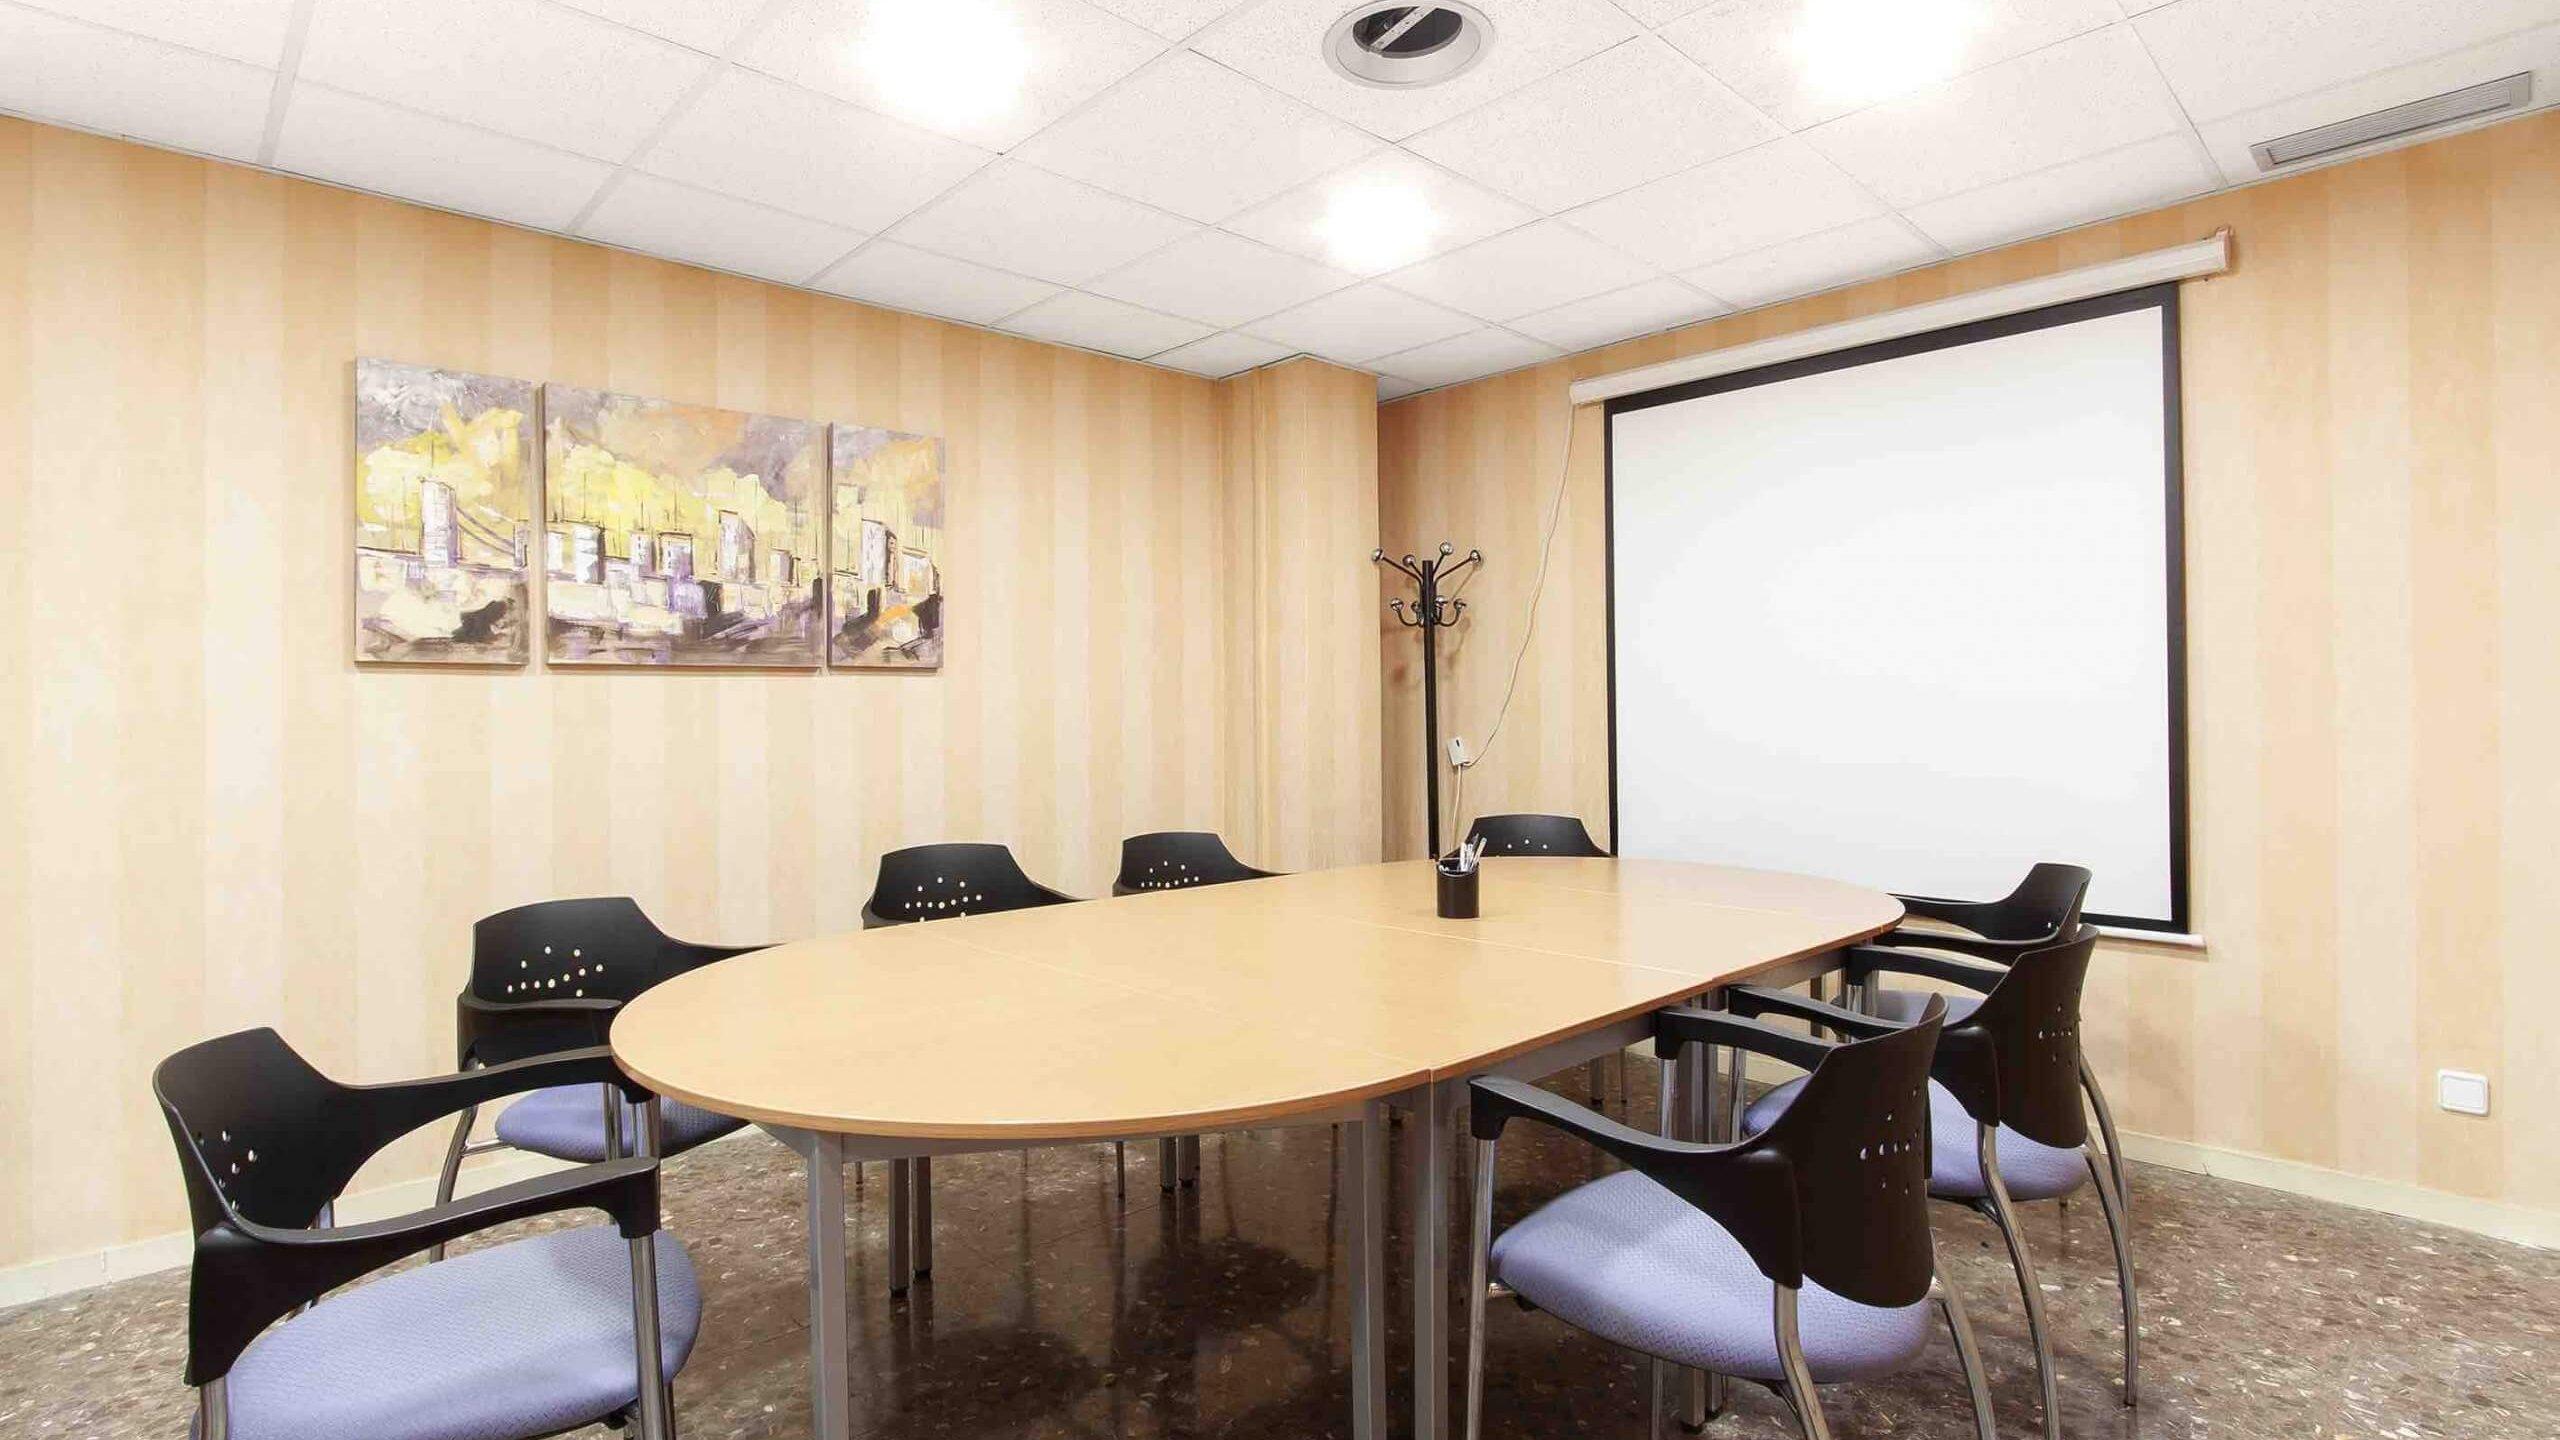 alquiler sala reuniones barcelona